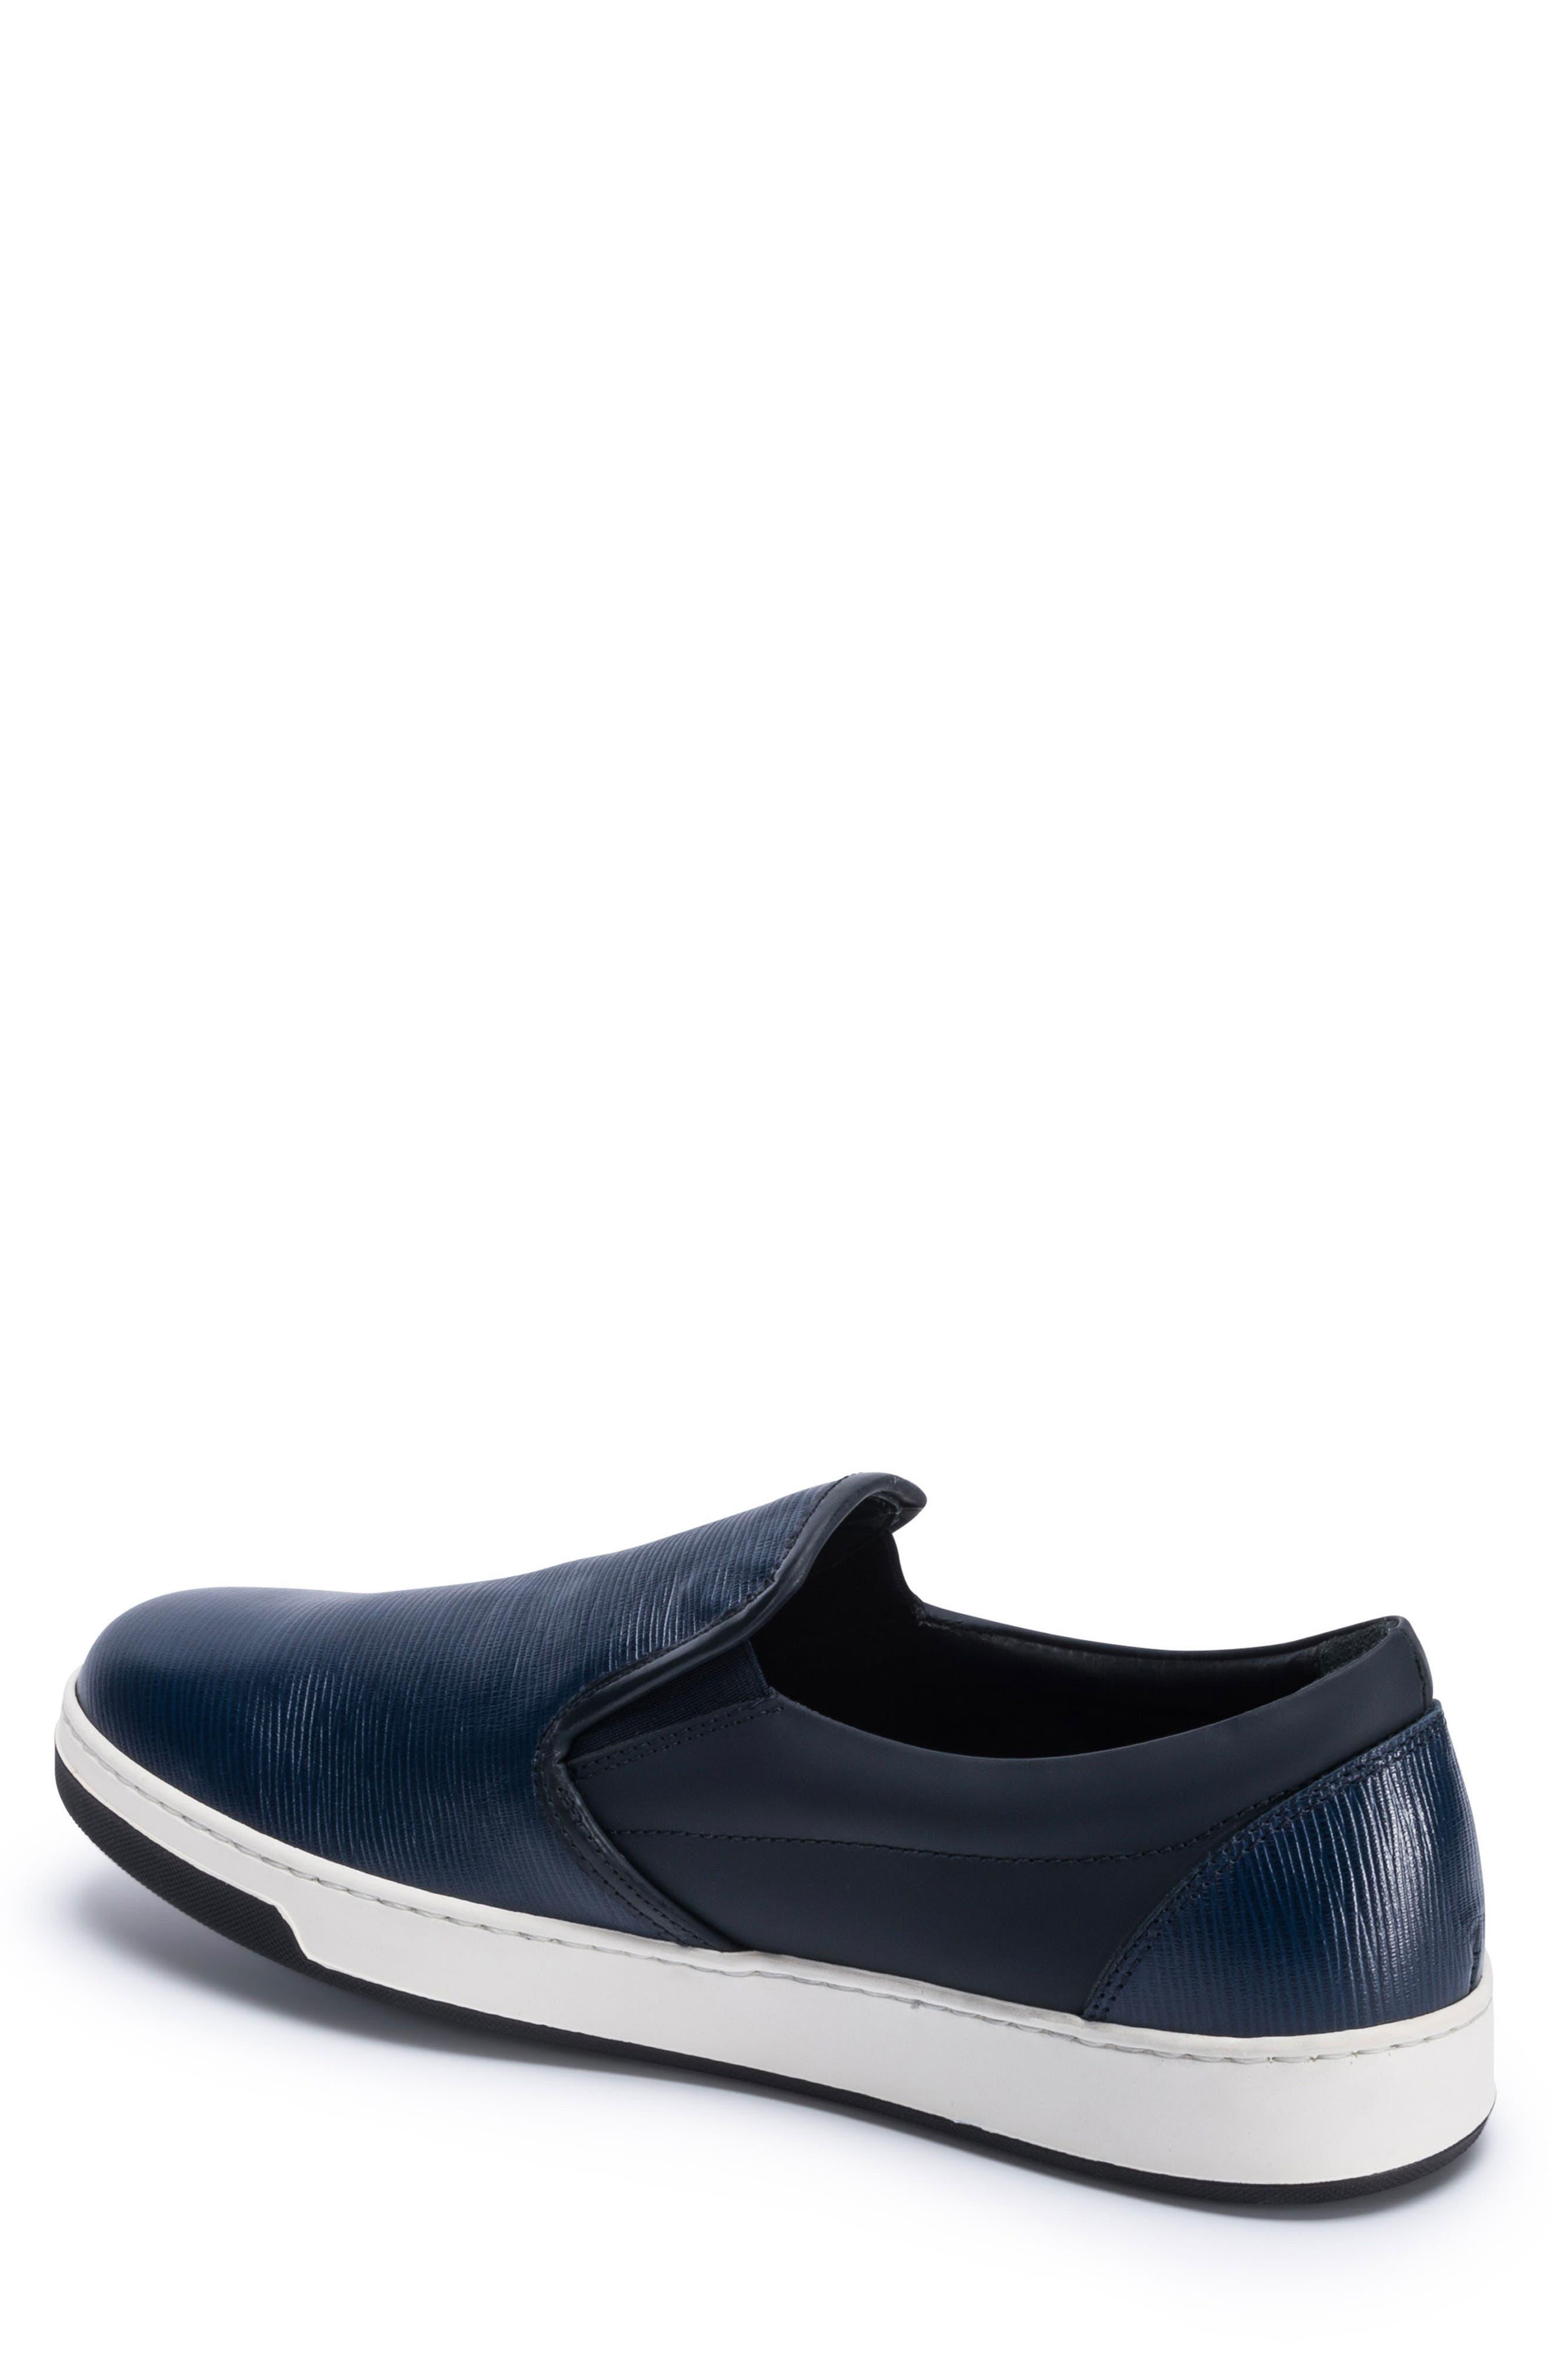 Alternate Image 2  - Bugatchi Santorini Slip-On Sneaker (Men)